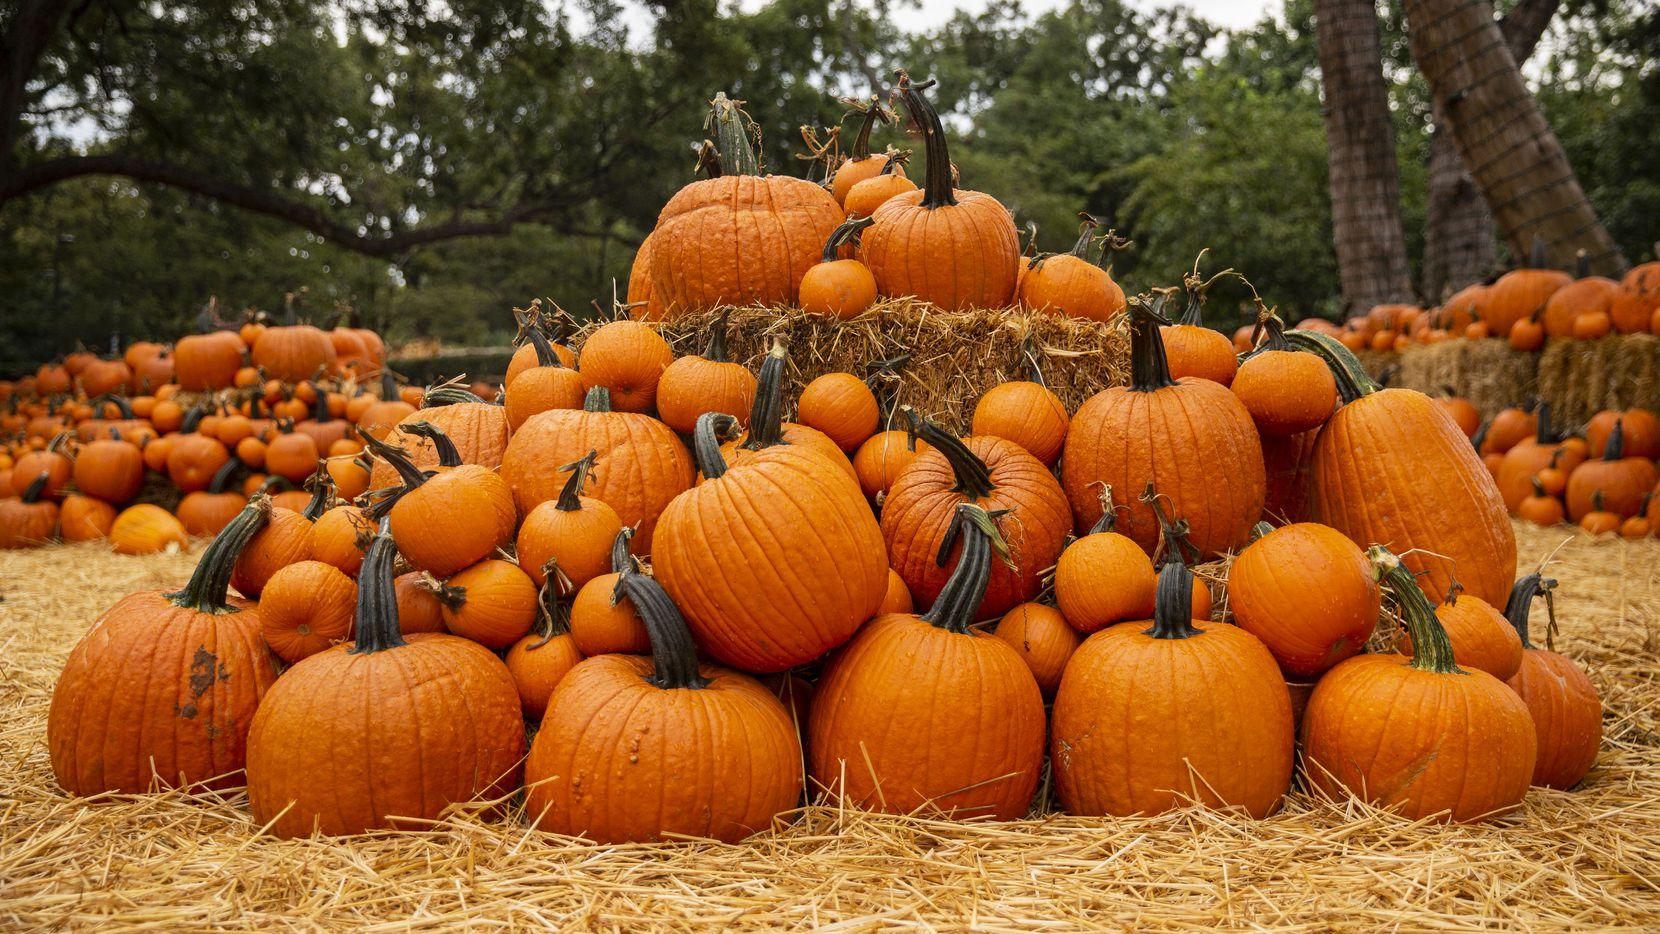 Pumpkins on display at the Dallas Arboretum's Pumpkin Village on Sept. 9, 2020 in Dallas. (Juan Figueroa/ The Dallas Morning News)